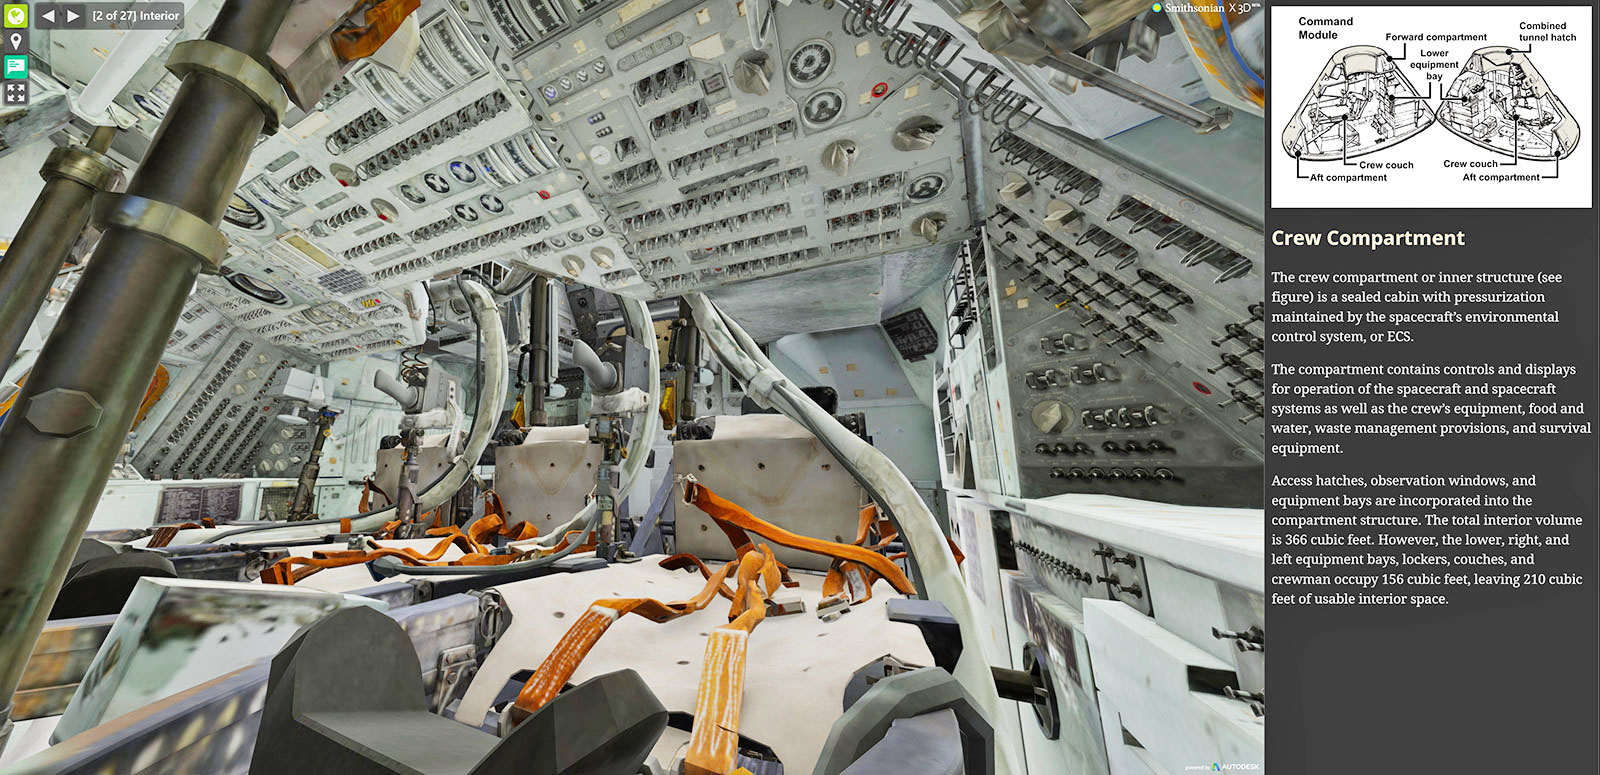 apollo spacecraft computer - photo #31